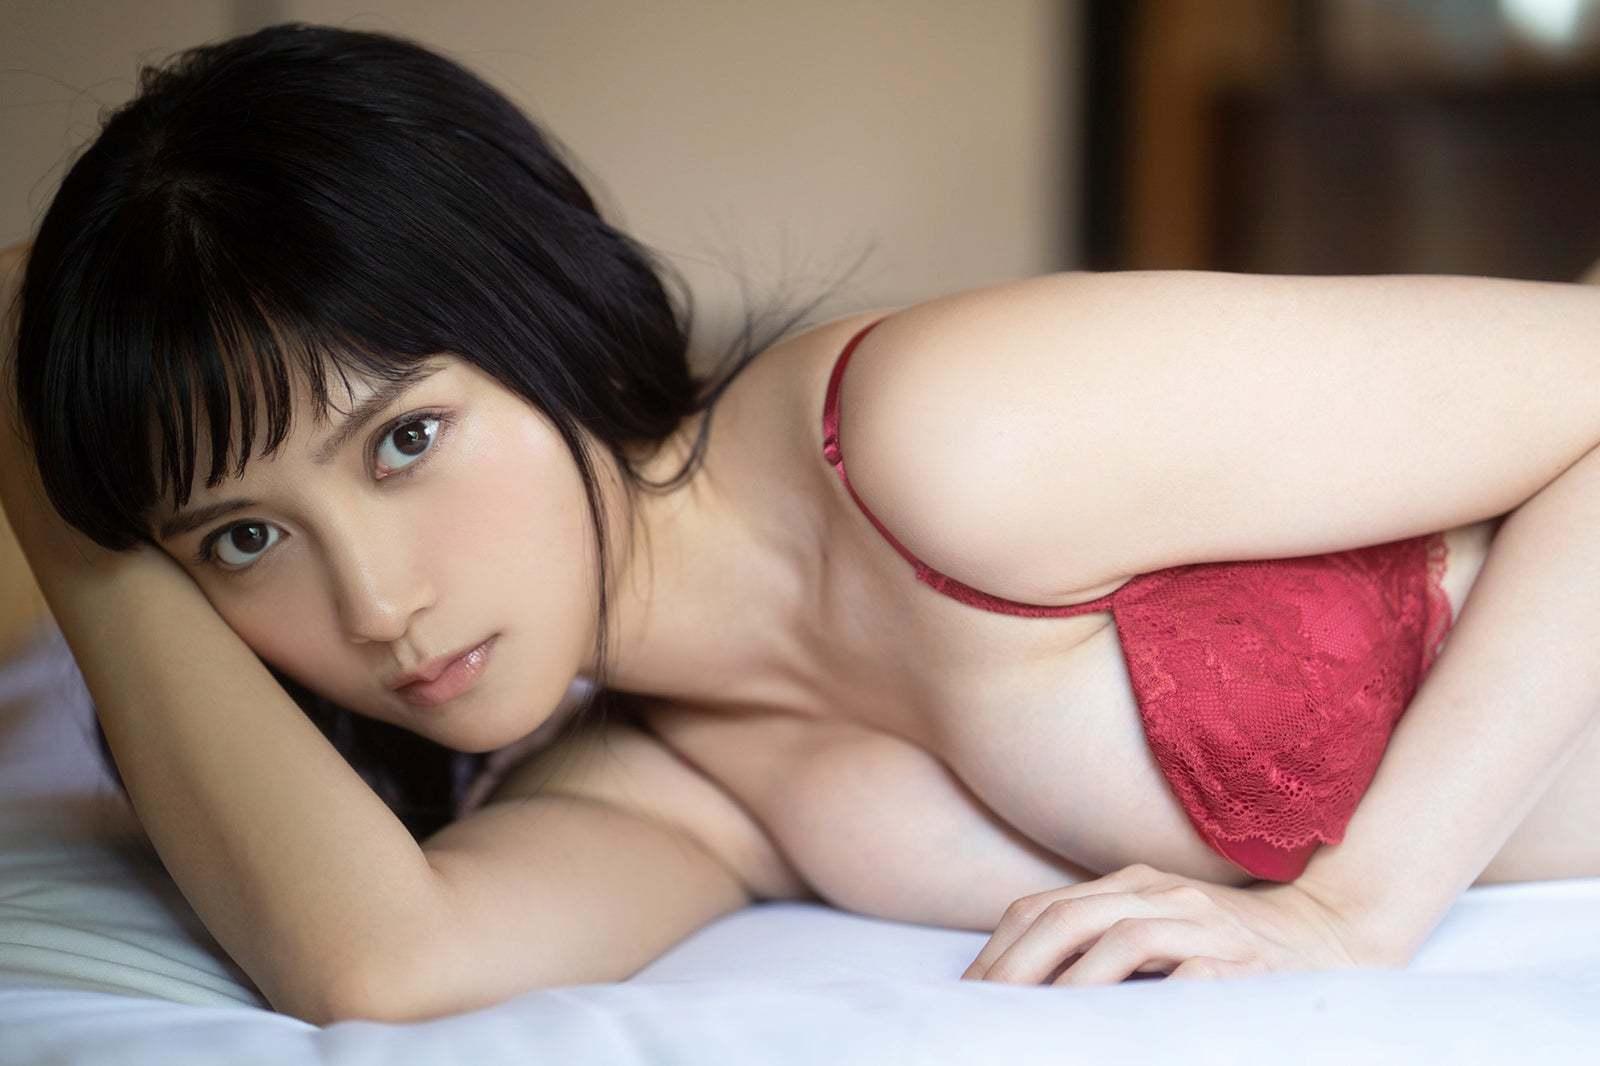 新婚人妻风写真,日本偶像Coser桃月なしこ杂志美图大赏!